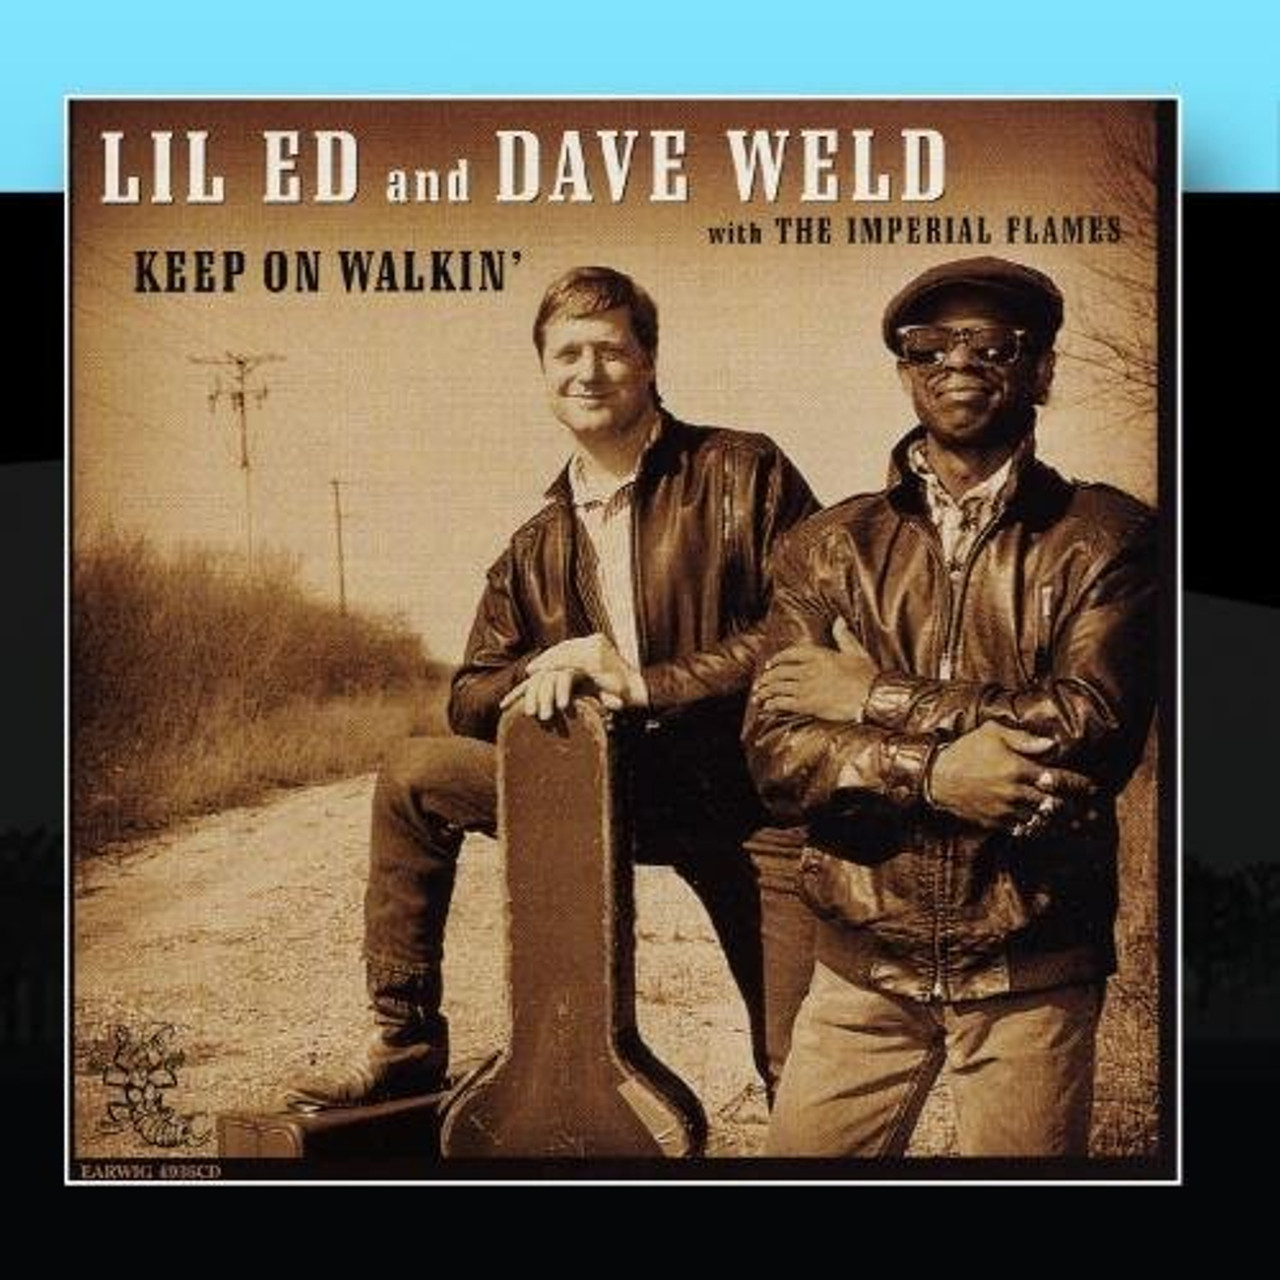 LIL' ED & DAVE WELD - KEEP ON WALKIN'